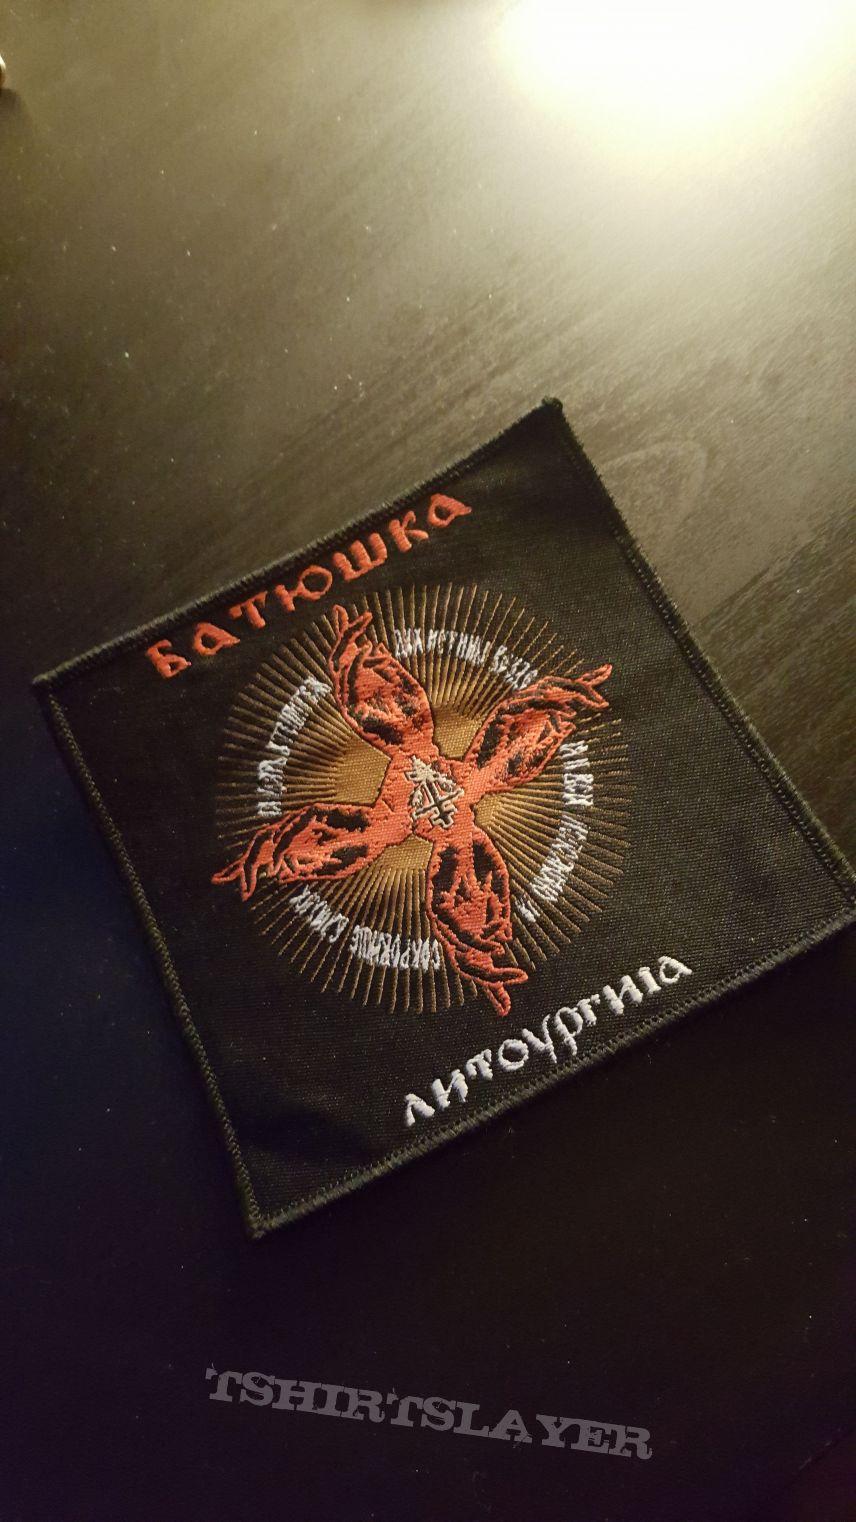 batushka patch